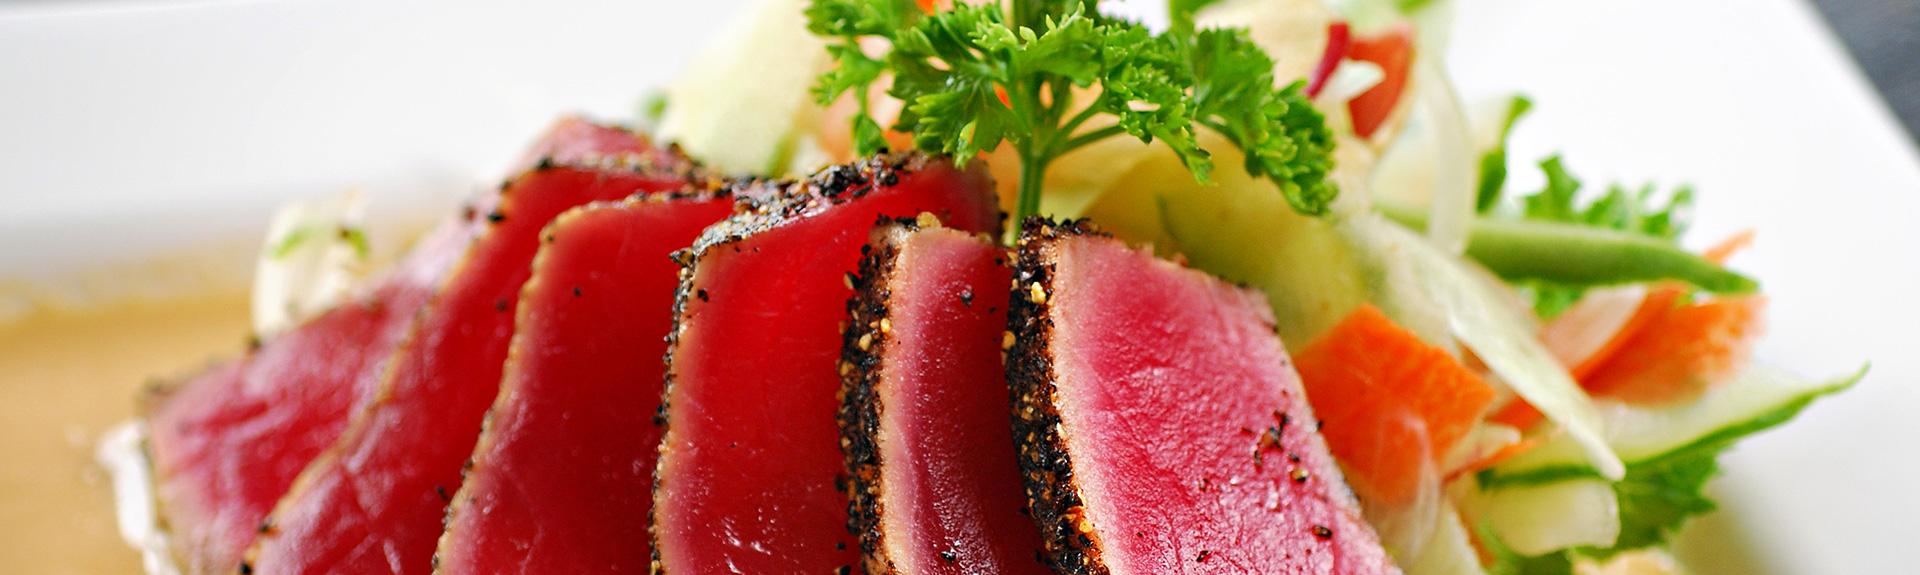 menu_Sushi-Sashimi-A-la-carte